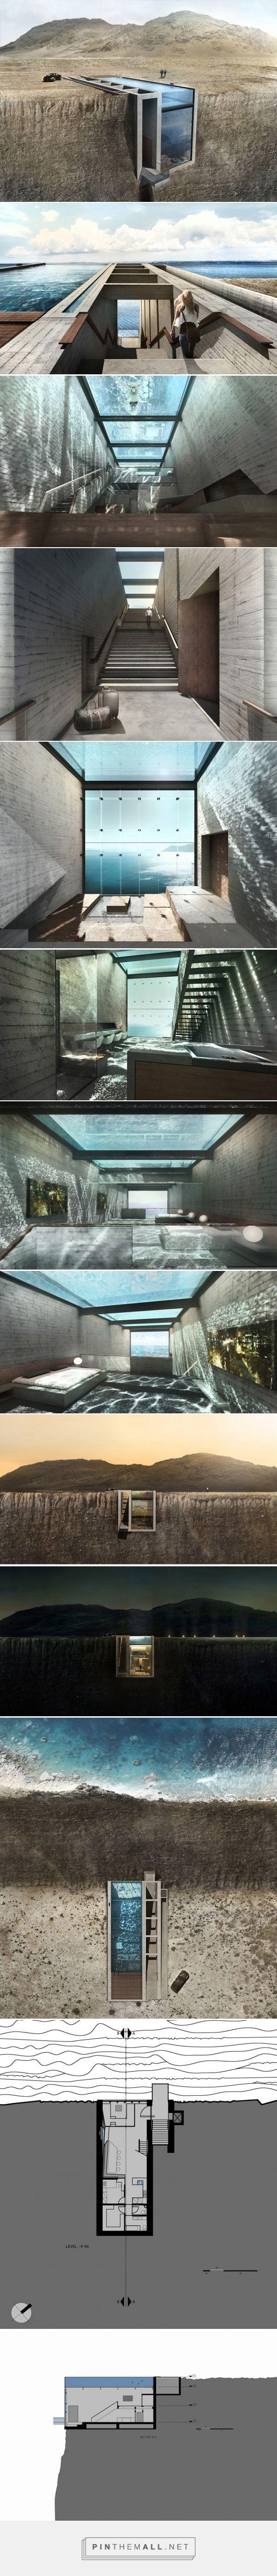 1000+ Images About Denenecek Projeler On Pinterest | Architecture ... 20 Tolle Swimmingpool Designs Geometrisch